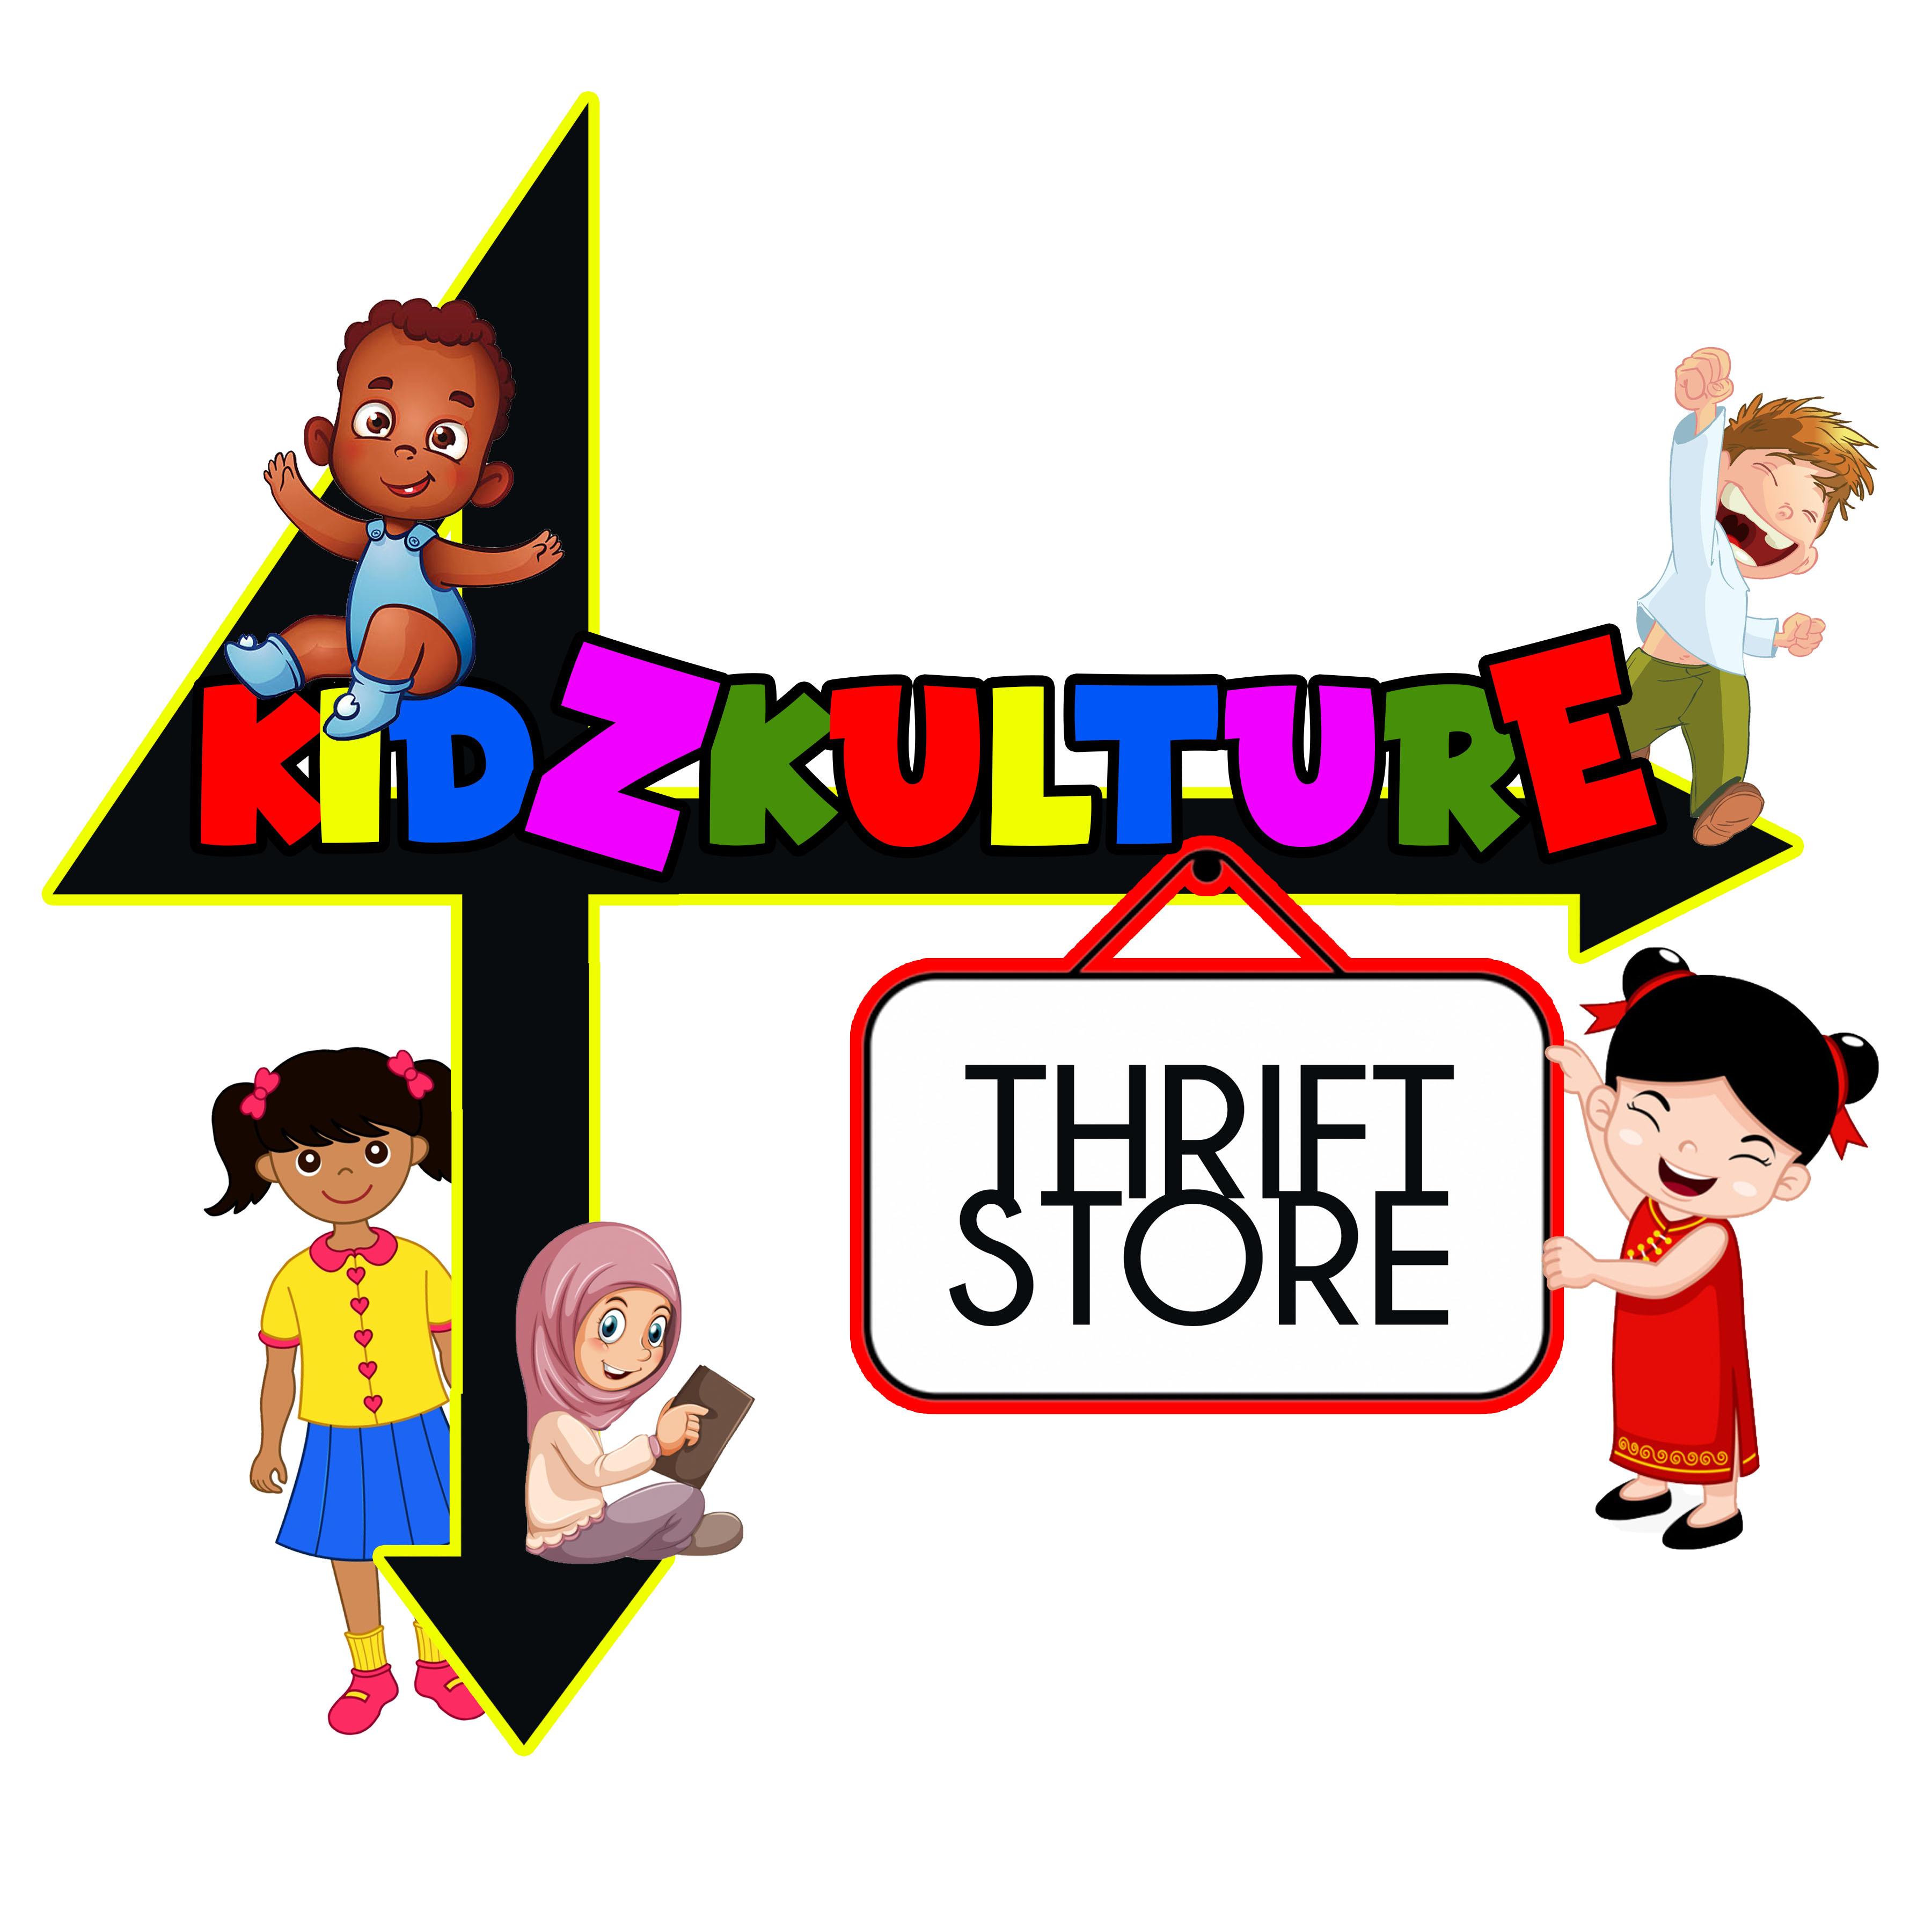 kidskulture